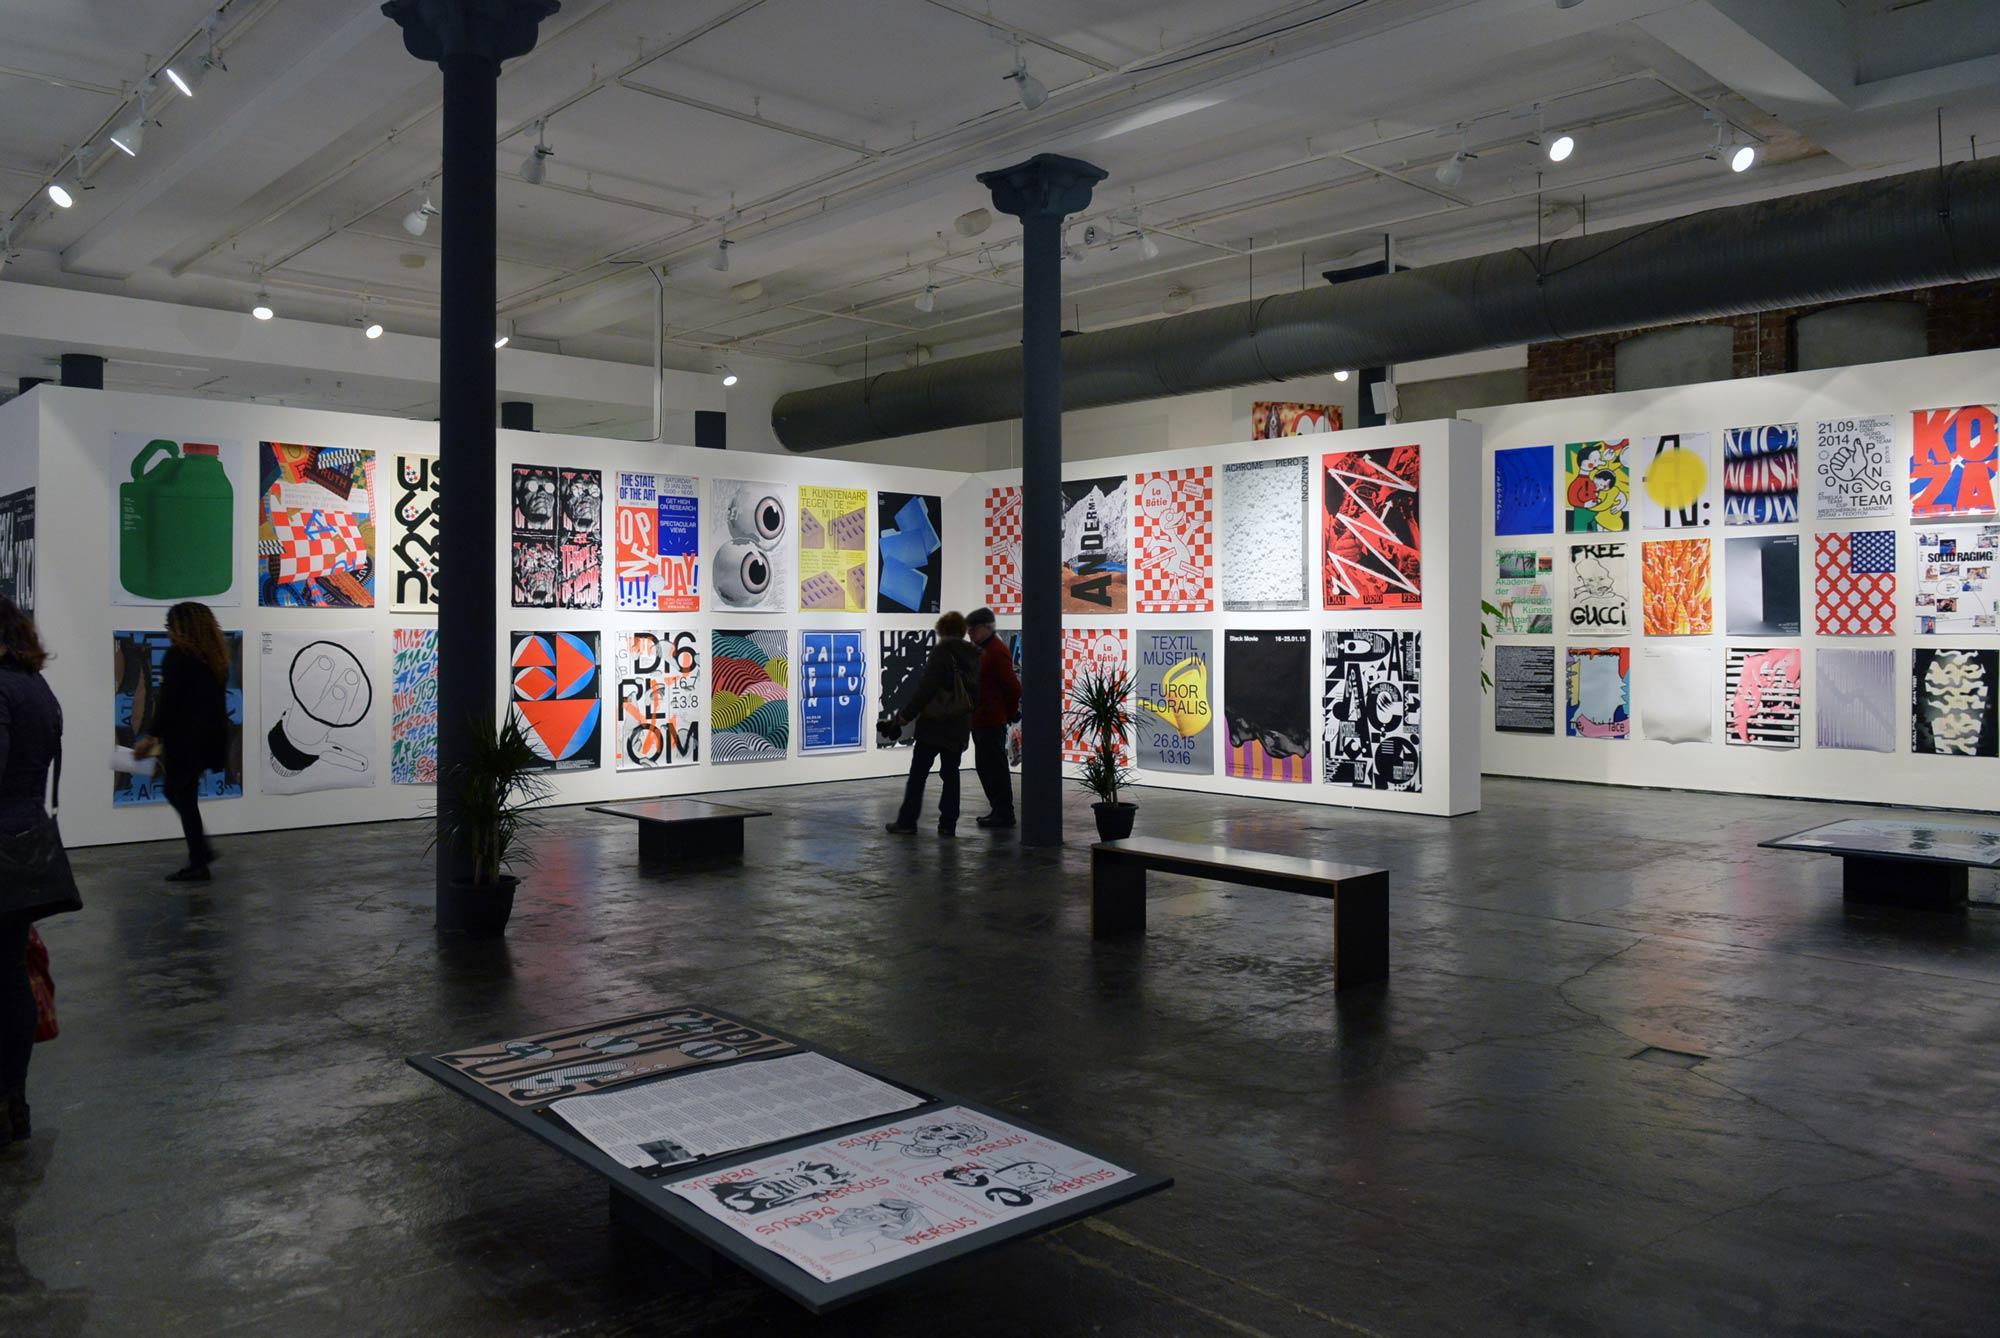 Exhibition Stand Poster Design : International poster exhibition graphic design